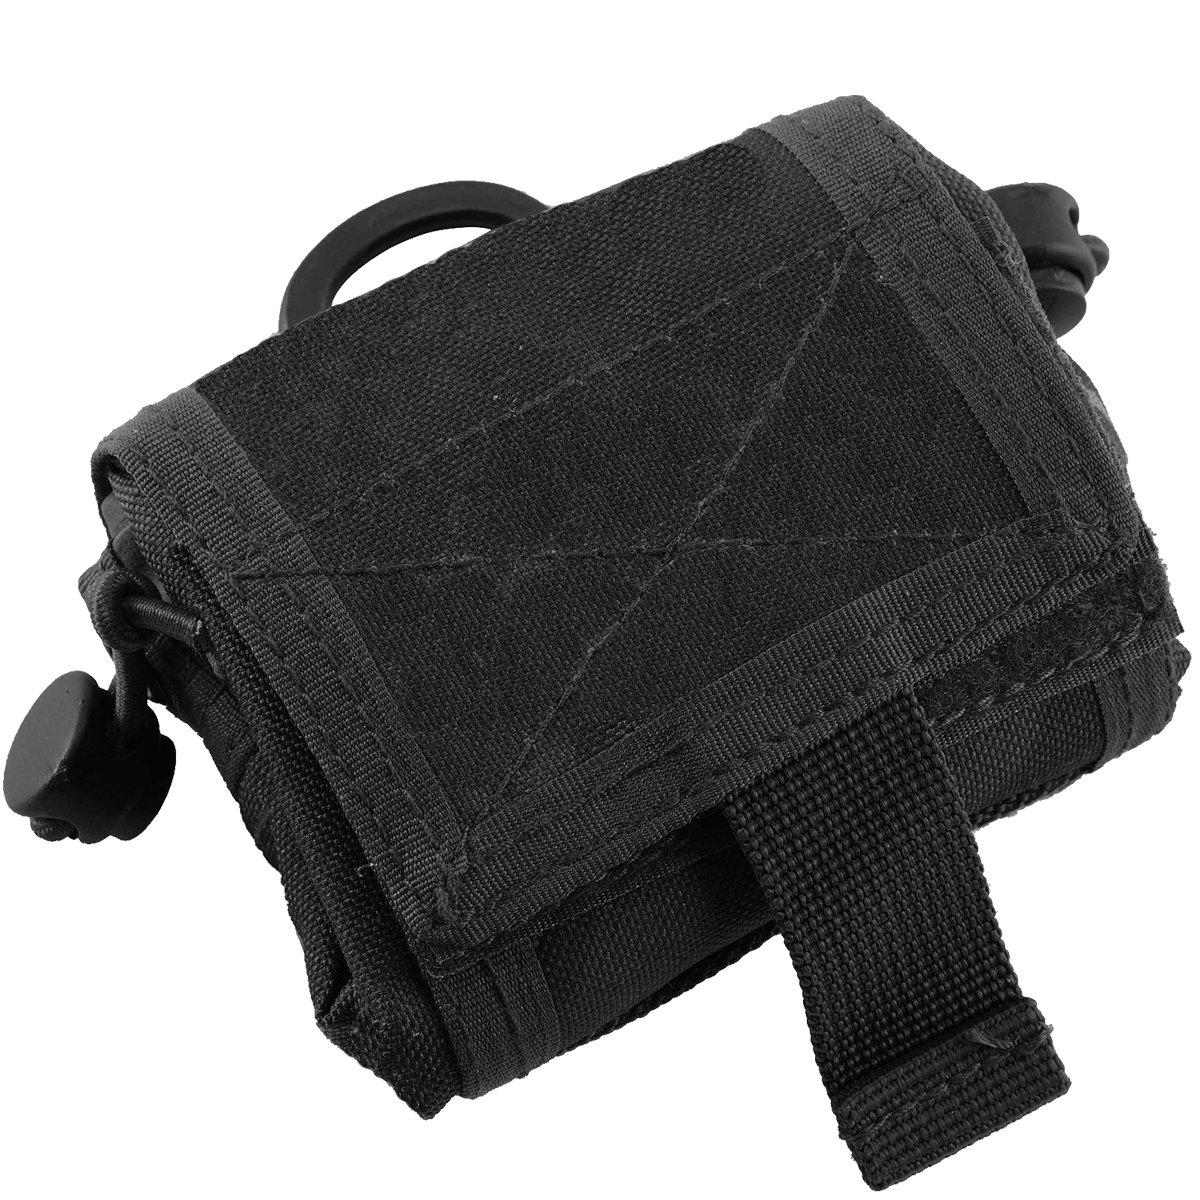 PENTAGON Dump Bolsa Negro